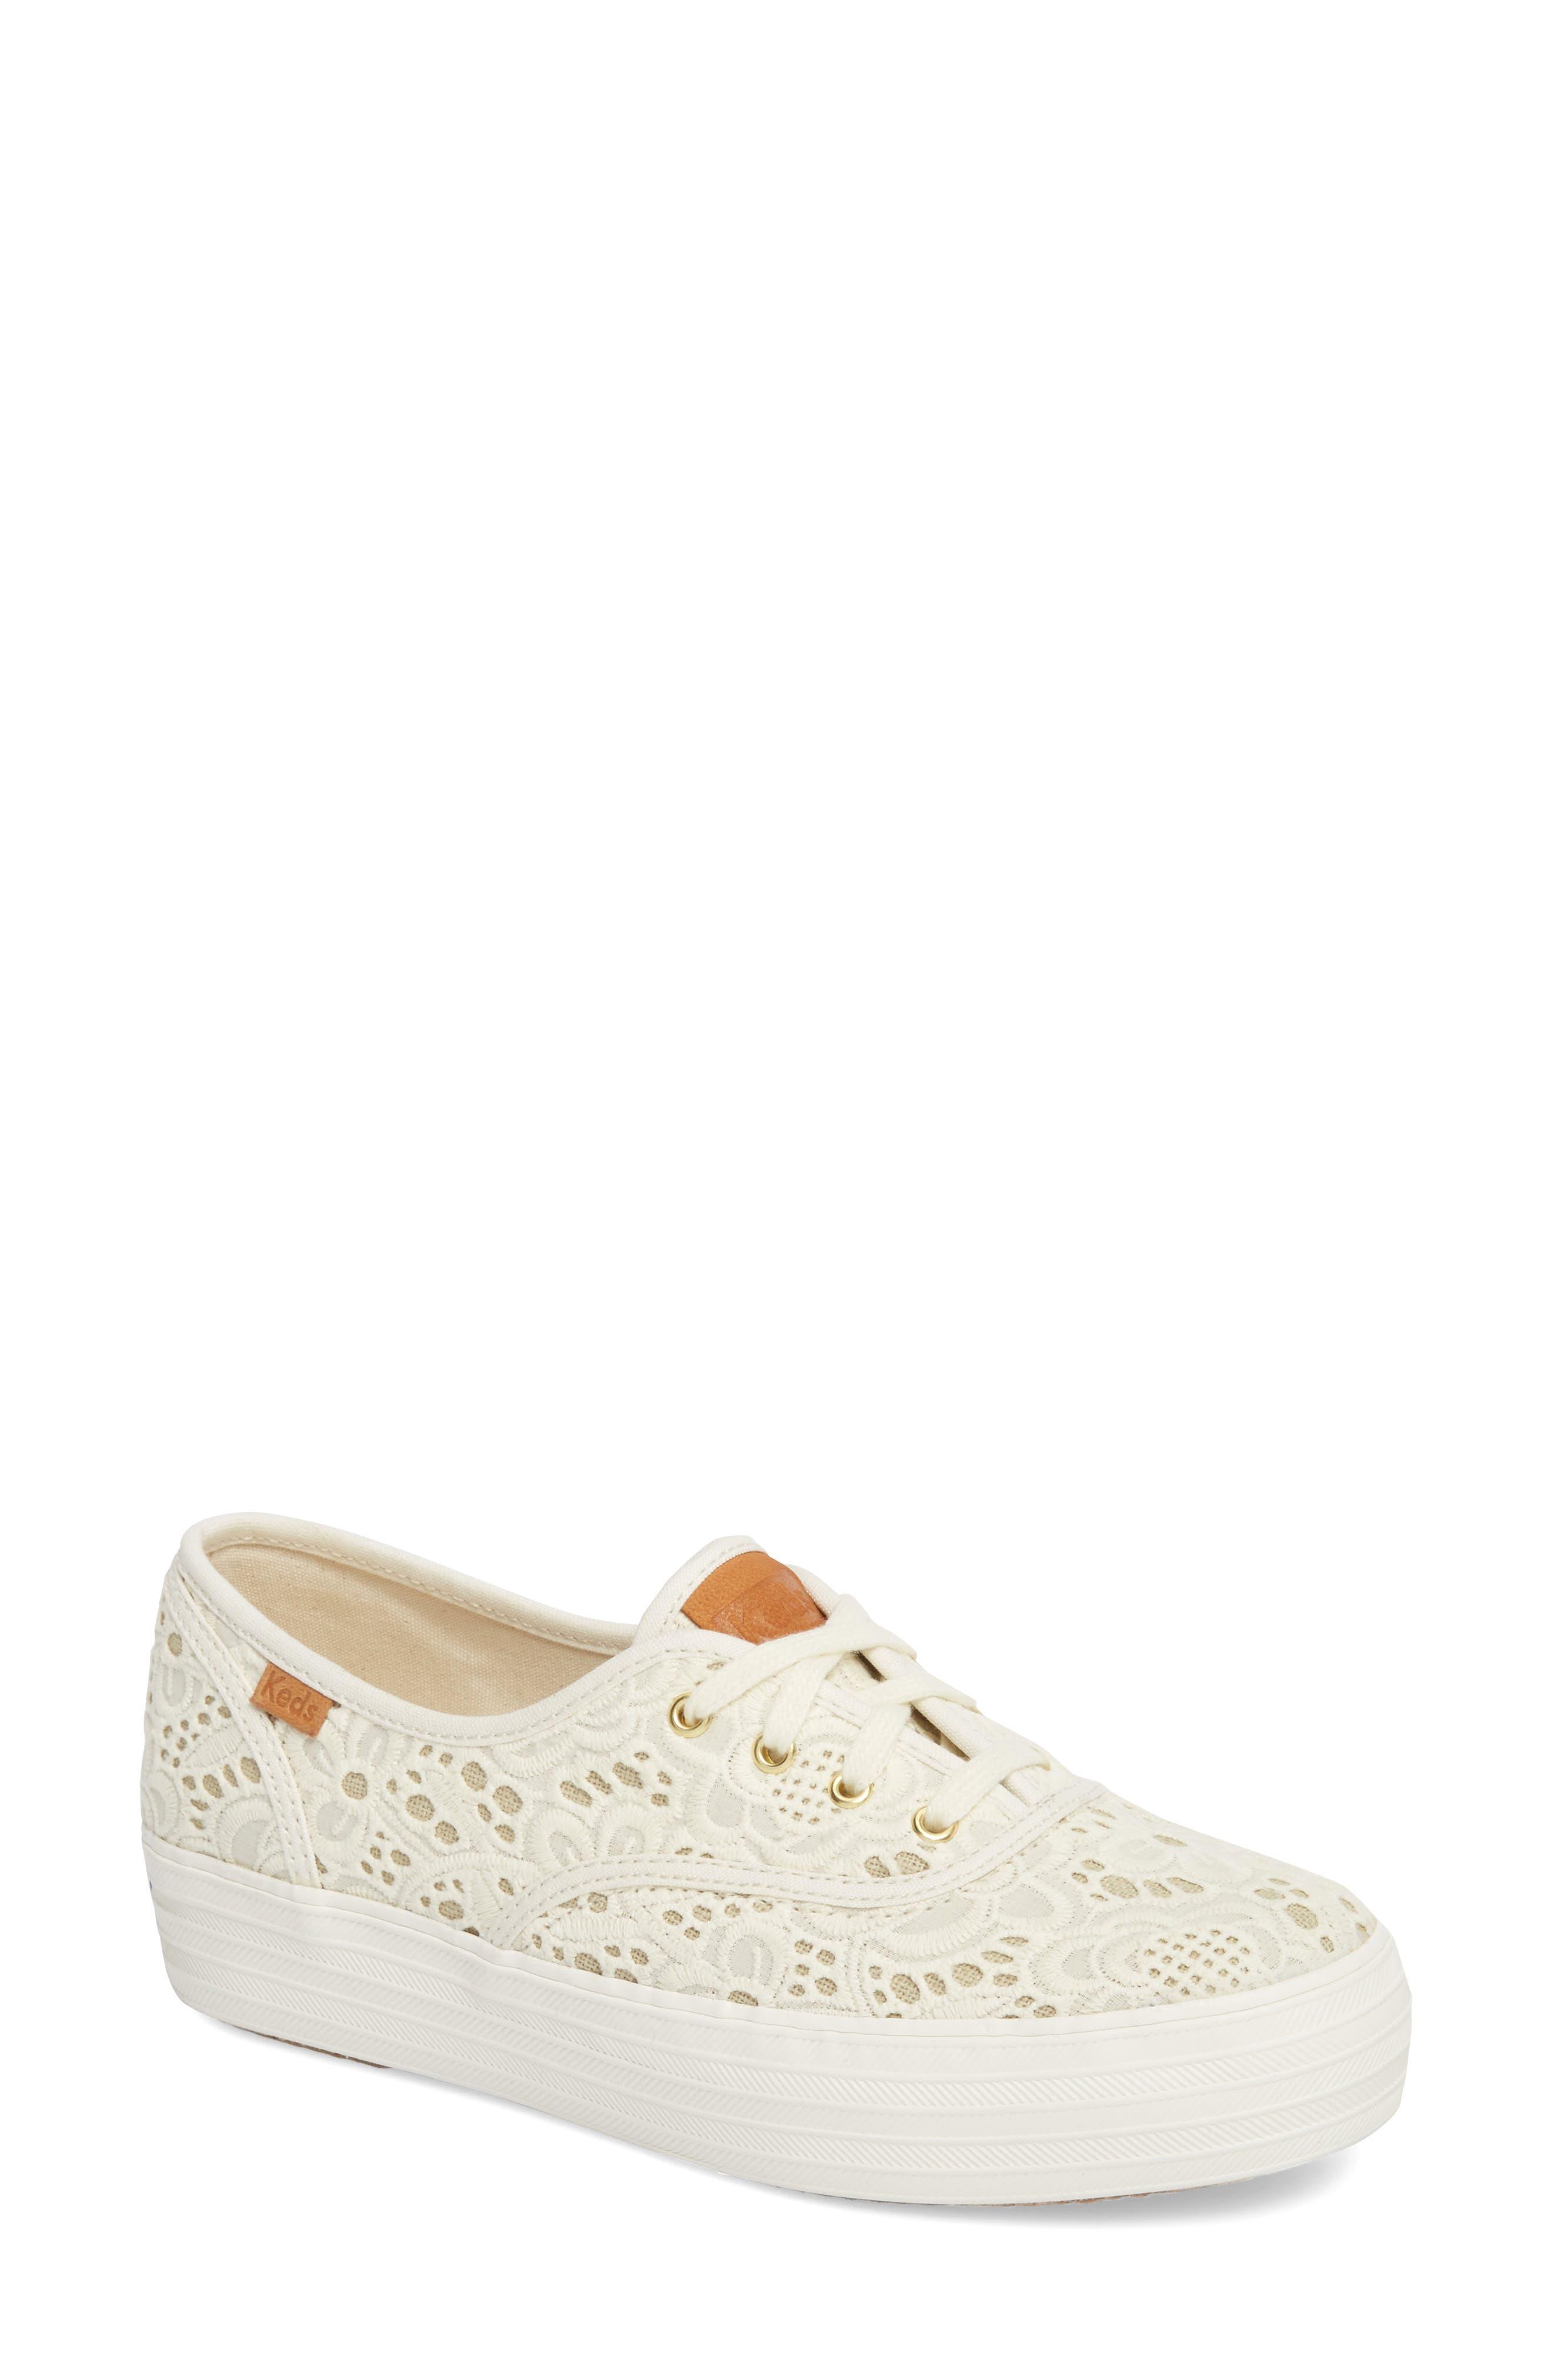 Main Image - Keds® Triple Embroidered Crochet Platform Sneaker (Women)